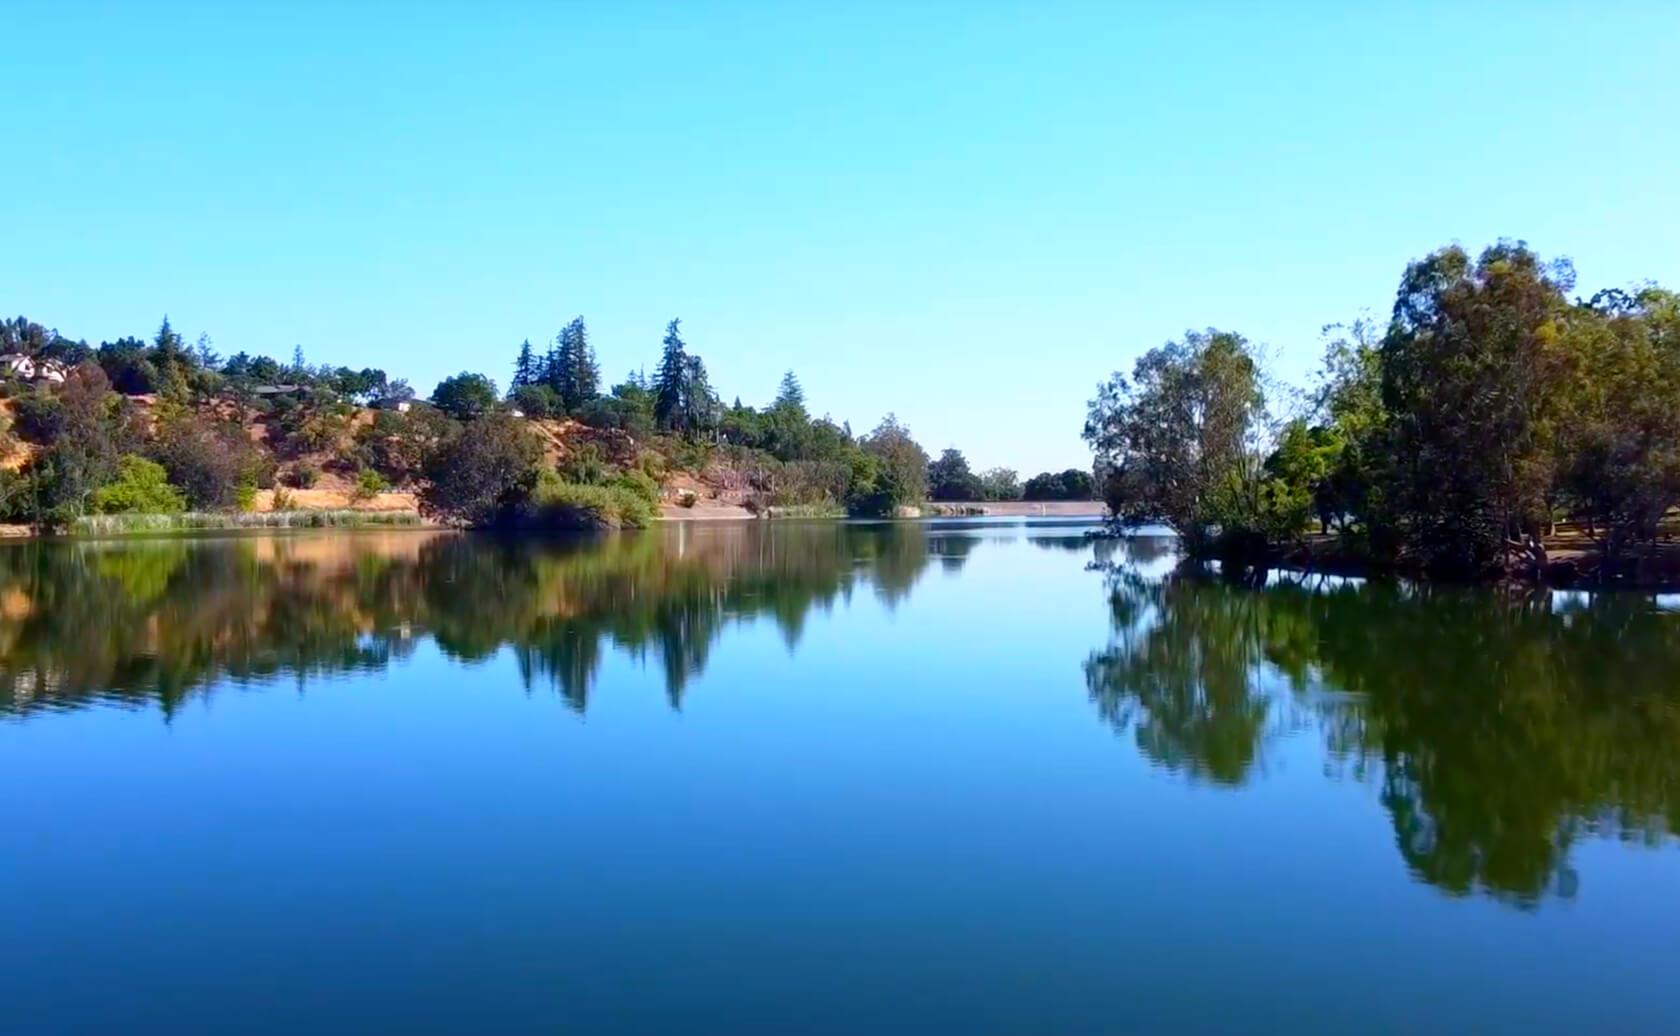 Vasona-Lake-Fishing-Guide-Report-Los-Gatos-CA-05